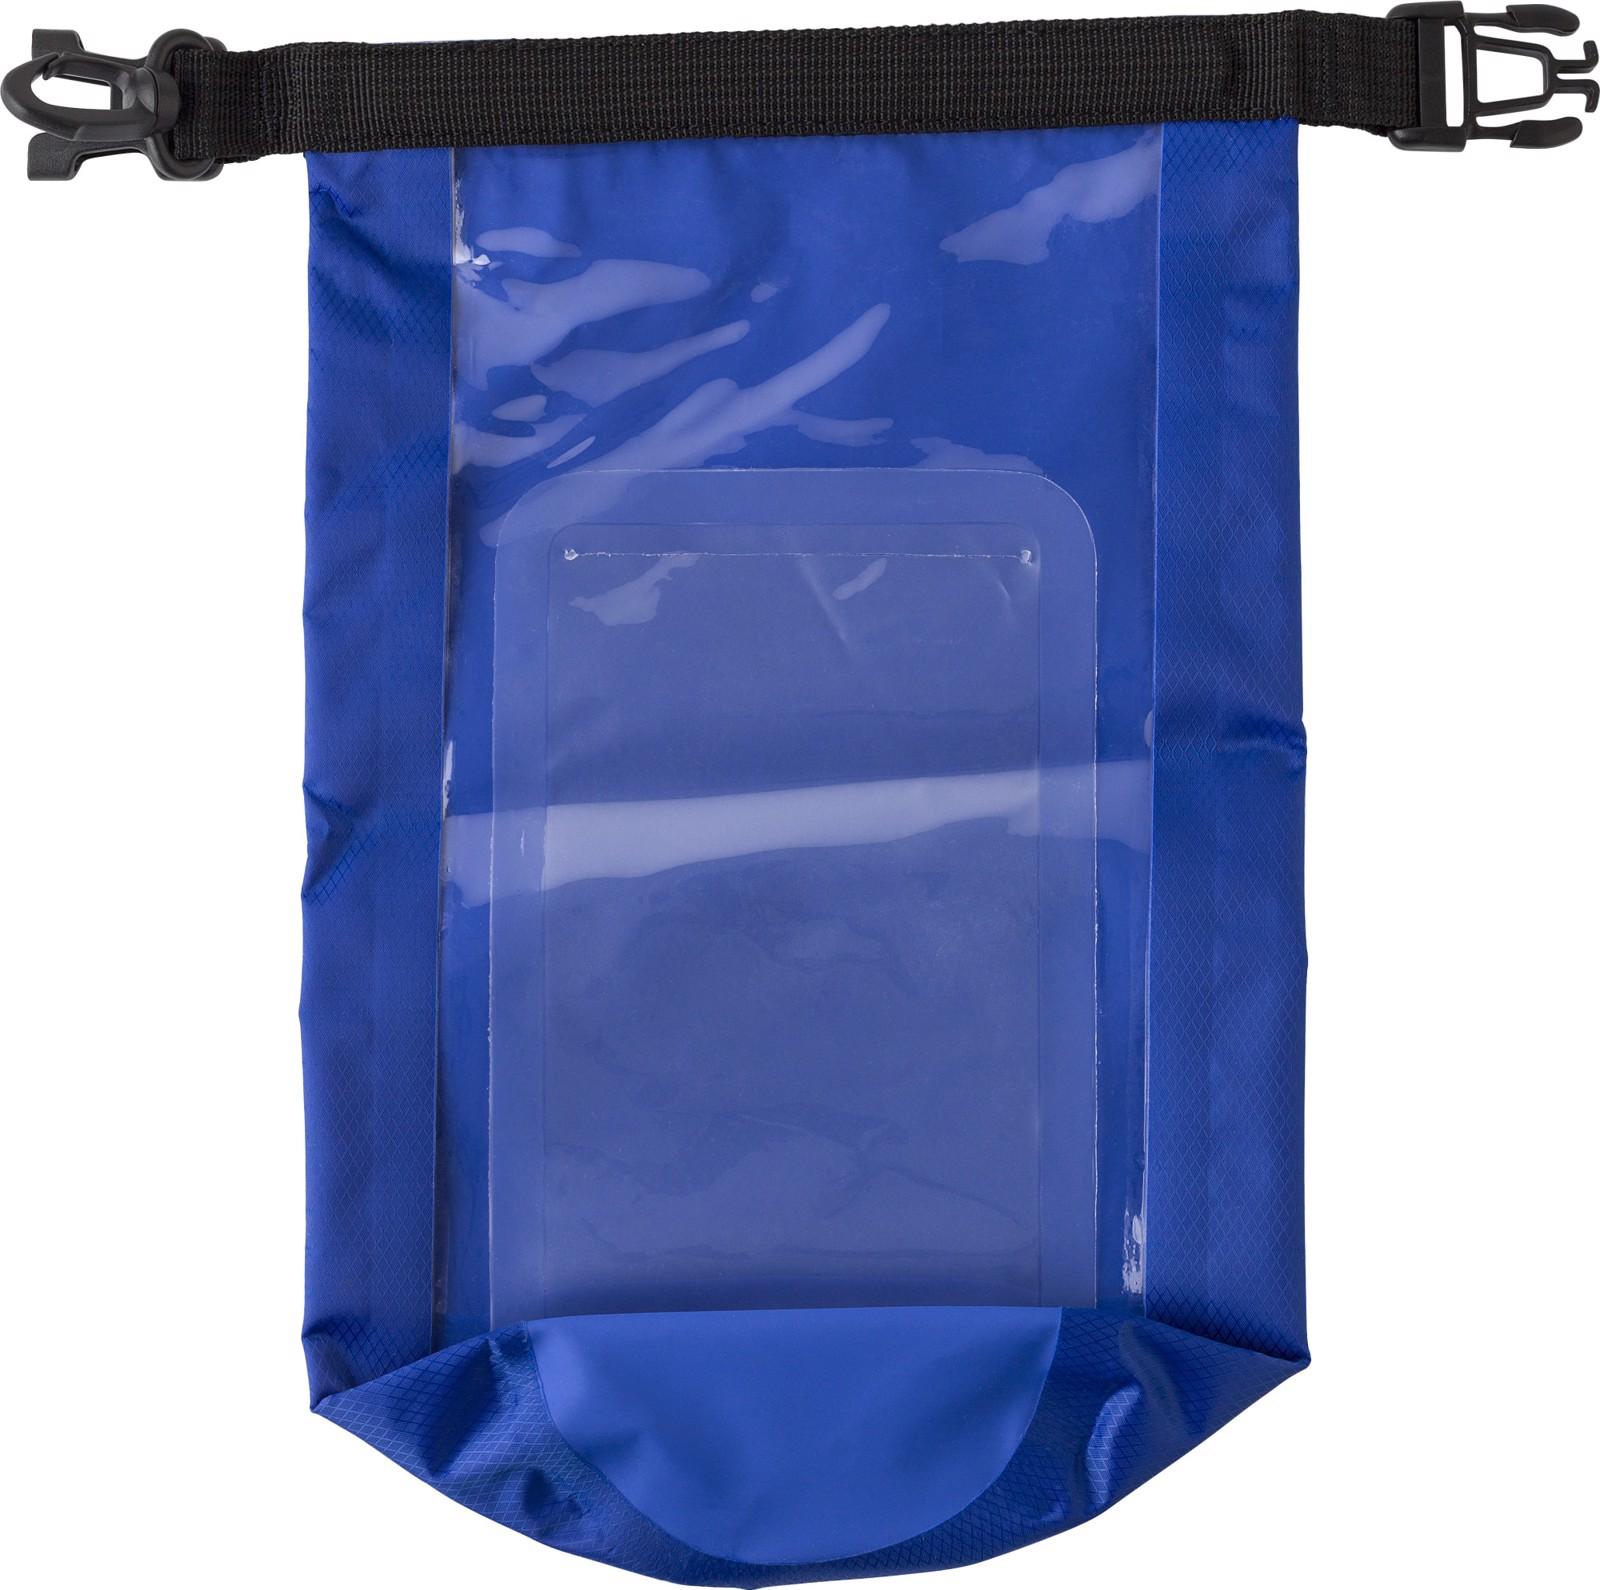 Polyester (210T) watertight bag - Cobalt Blue